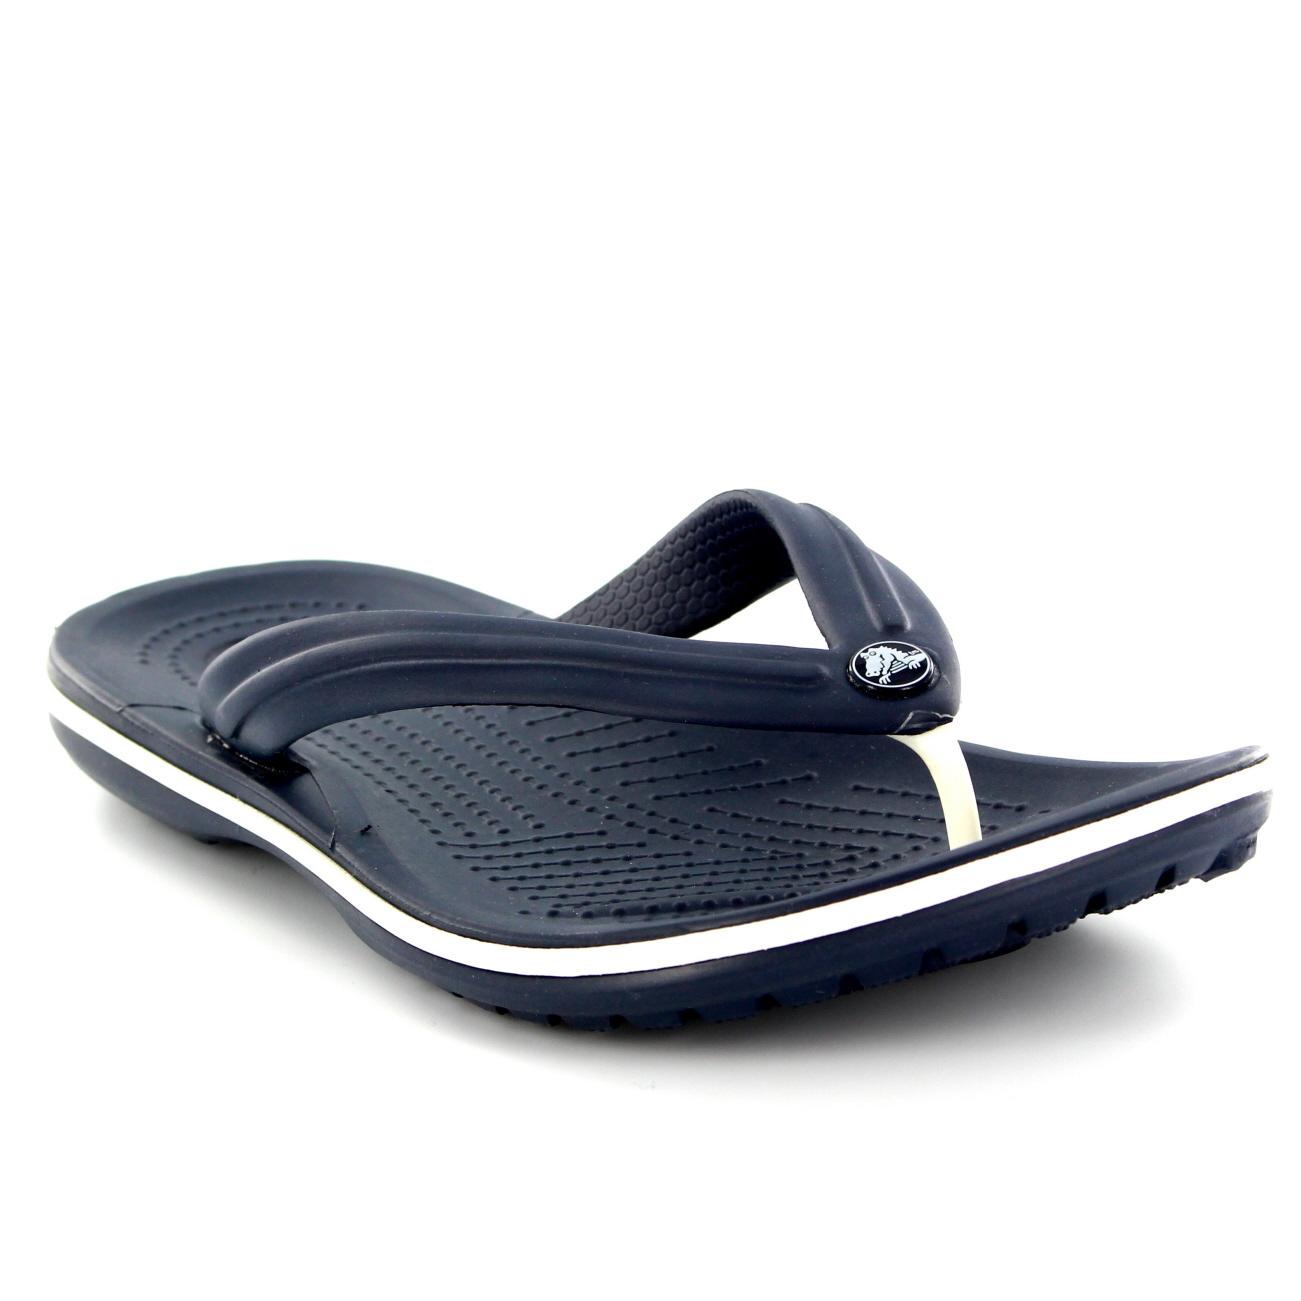 Crocs Crocband Flip Flip-Flops